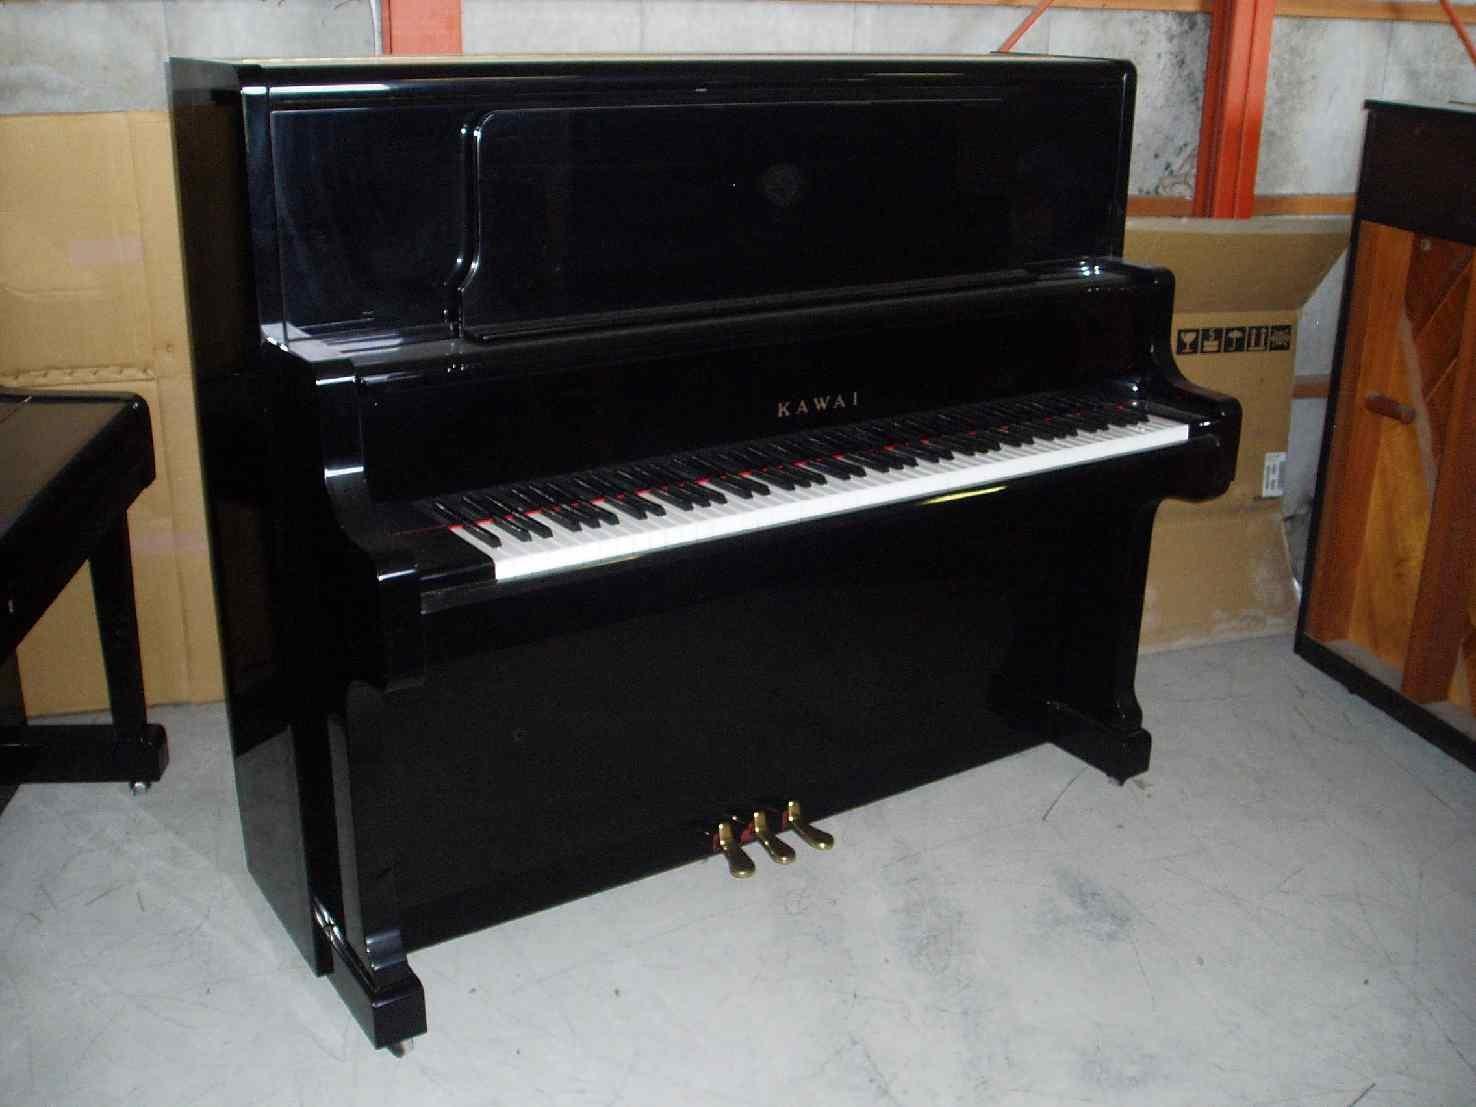 Japanese Used Piano Kawai Ns-15 - Buy Piano,Upright Piano,Keyboard Piano  Product on Alibaba com